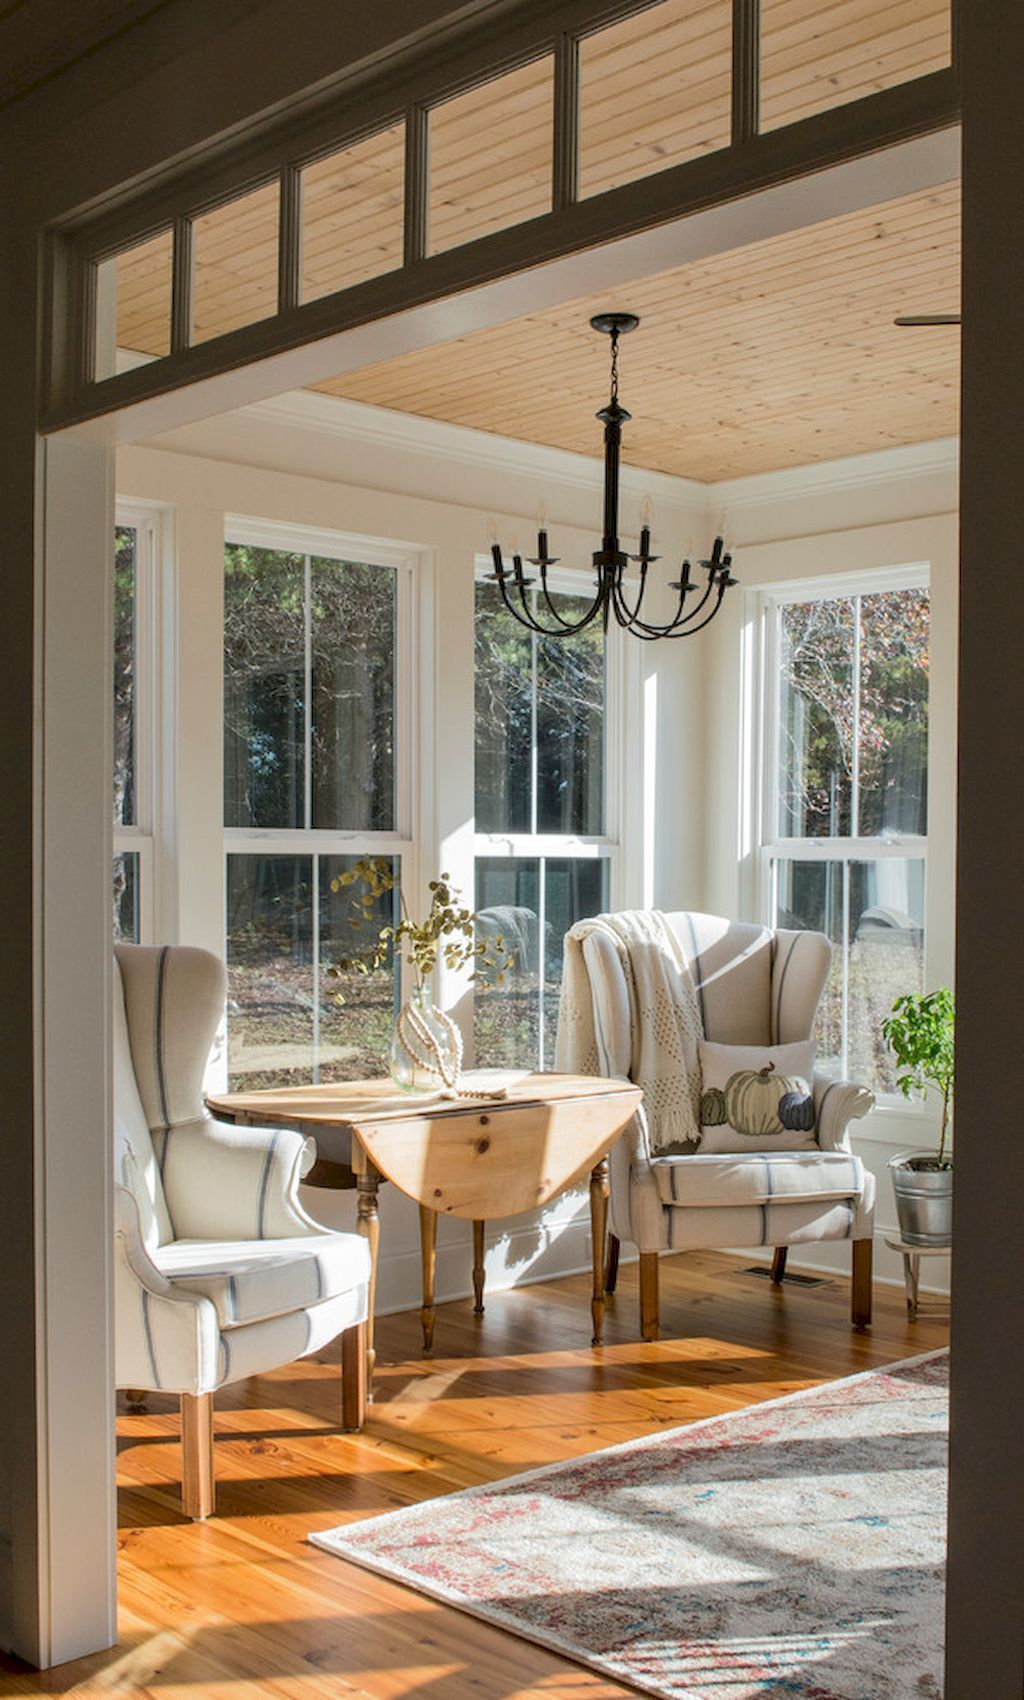 Home Additions Sunroom Decorating Four Seasons Room: Sunroom Decorating, Sunroom Furniture, Small Sunroom